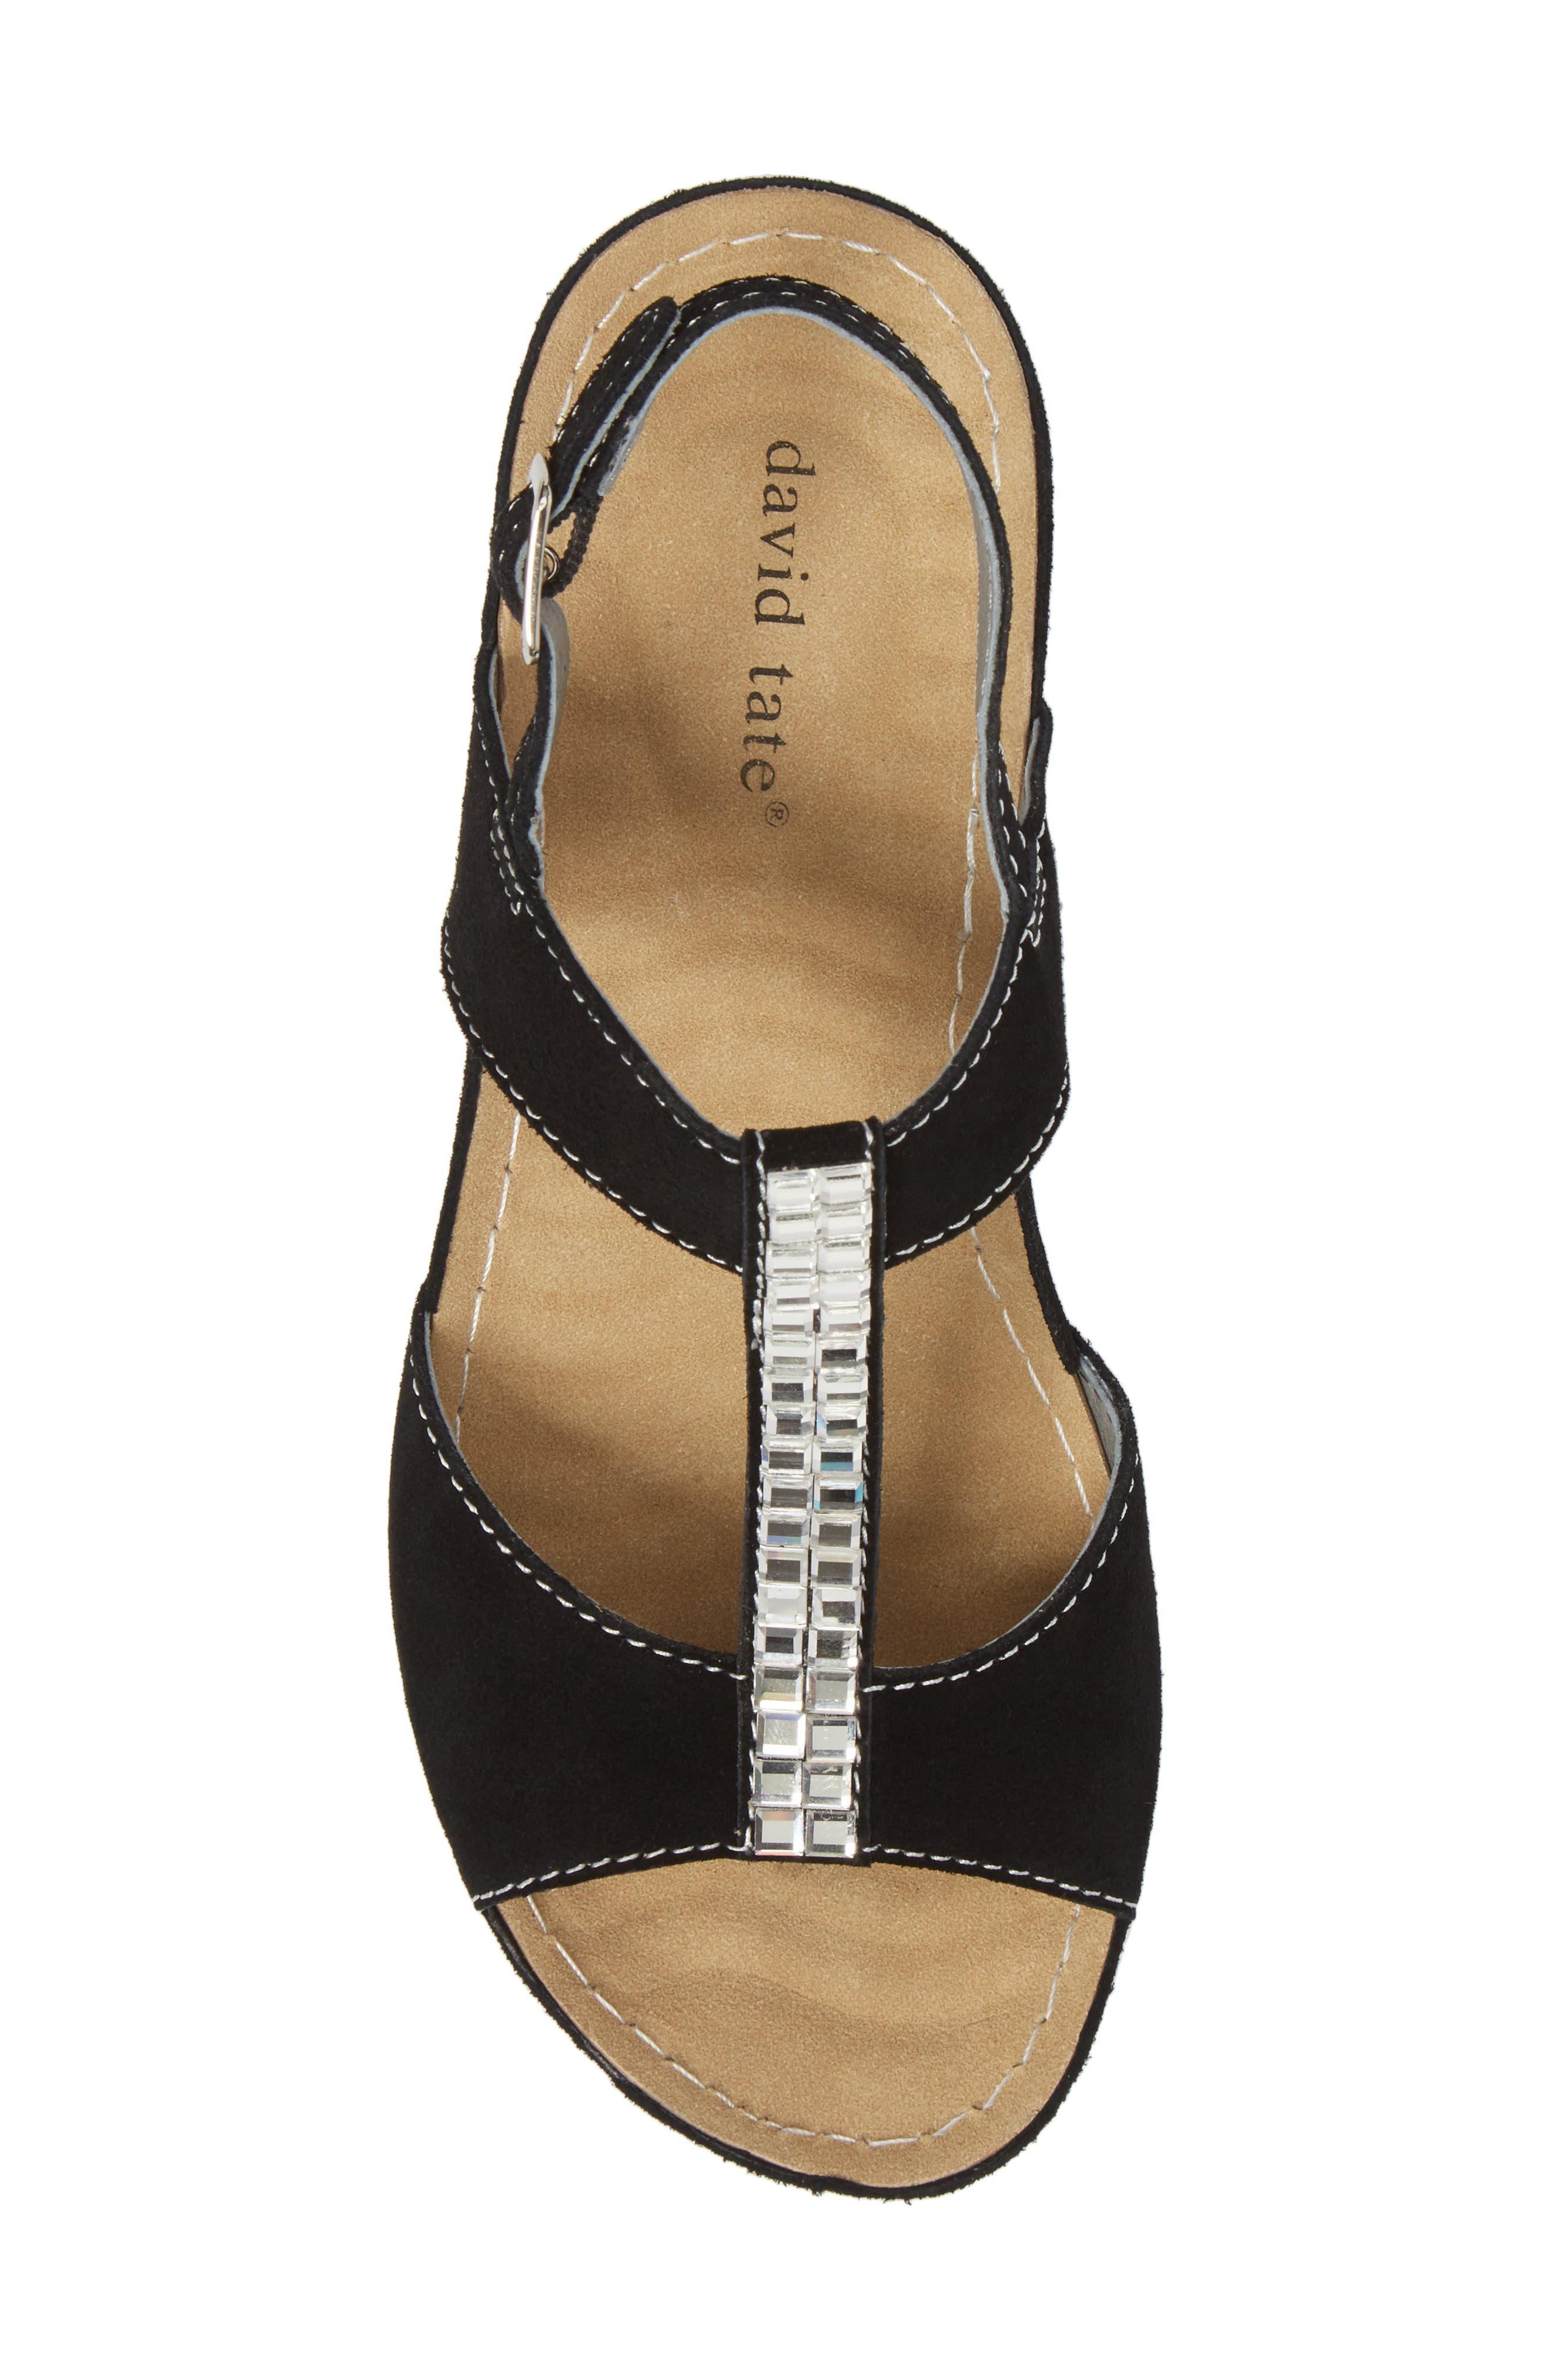 Bubbly Embellished T-Strap Wedge Sandal,                             Alternate thumbnail 5, color,                             Black Suede